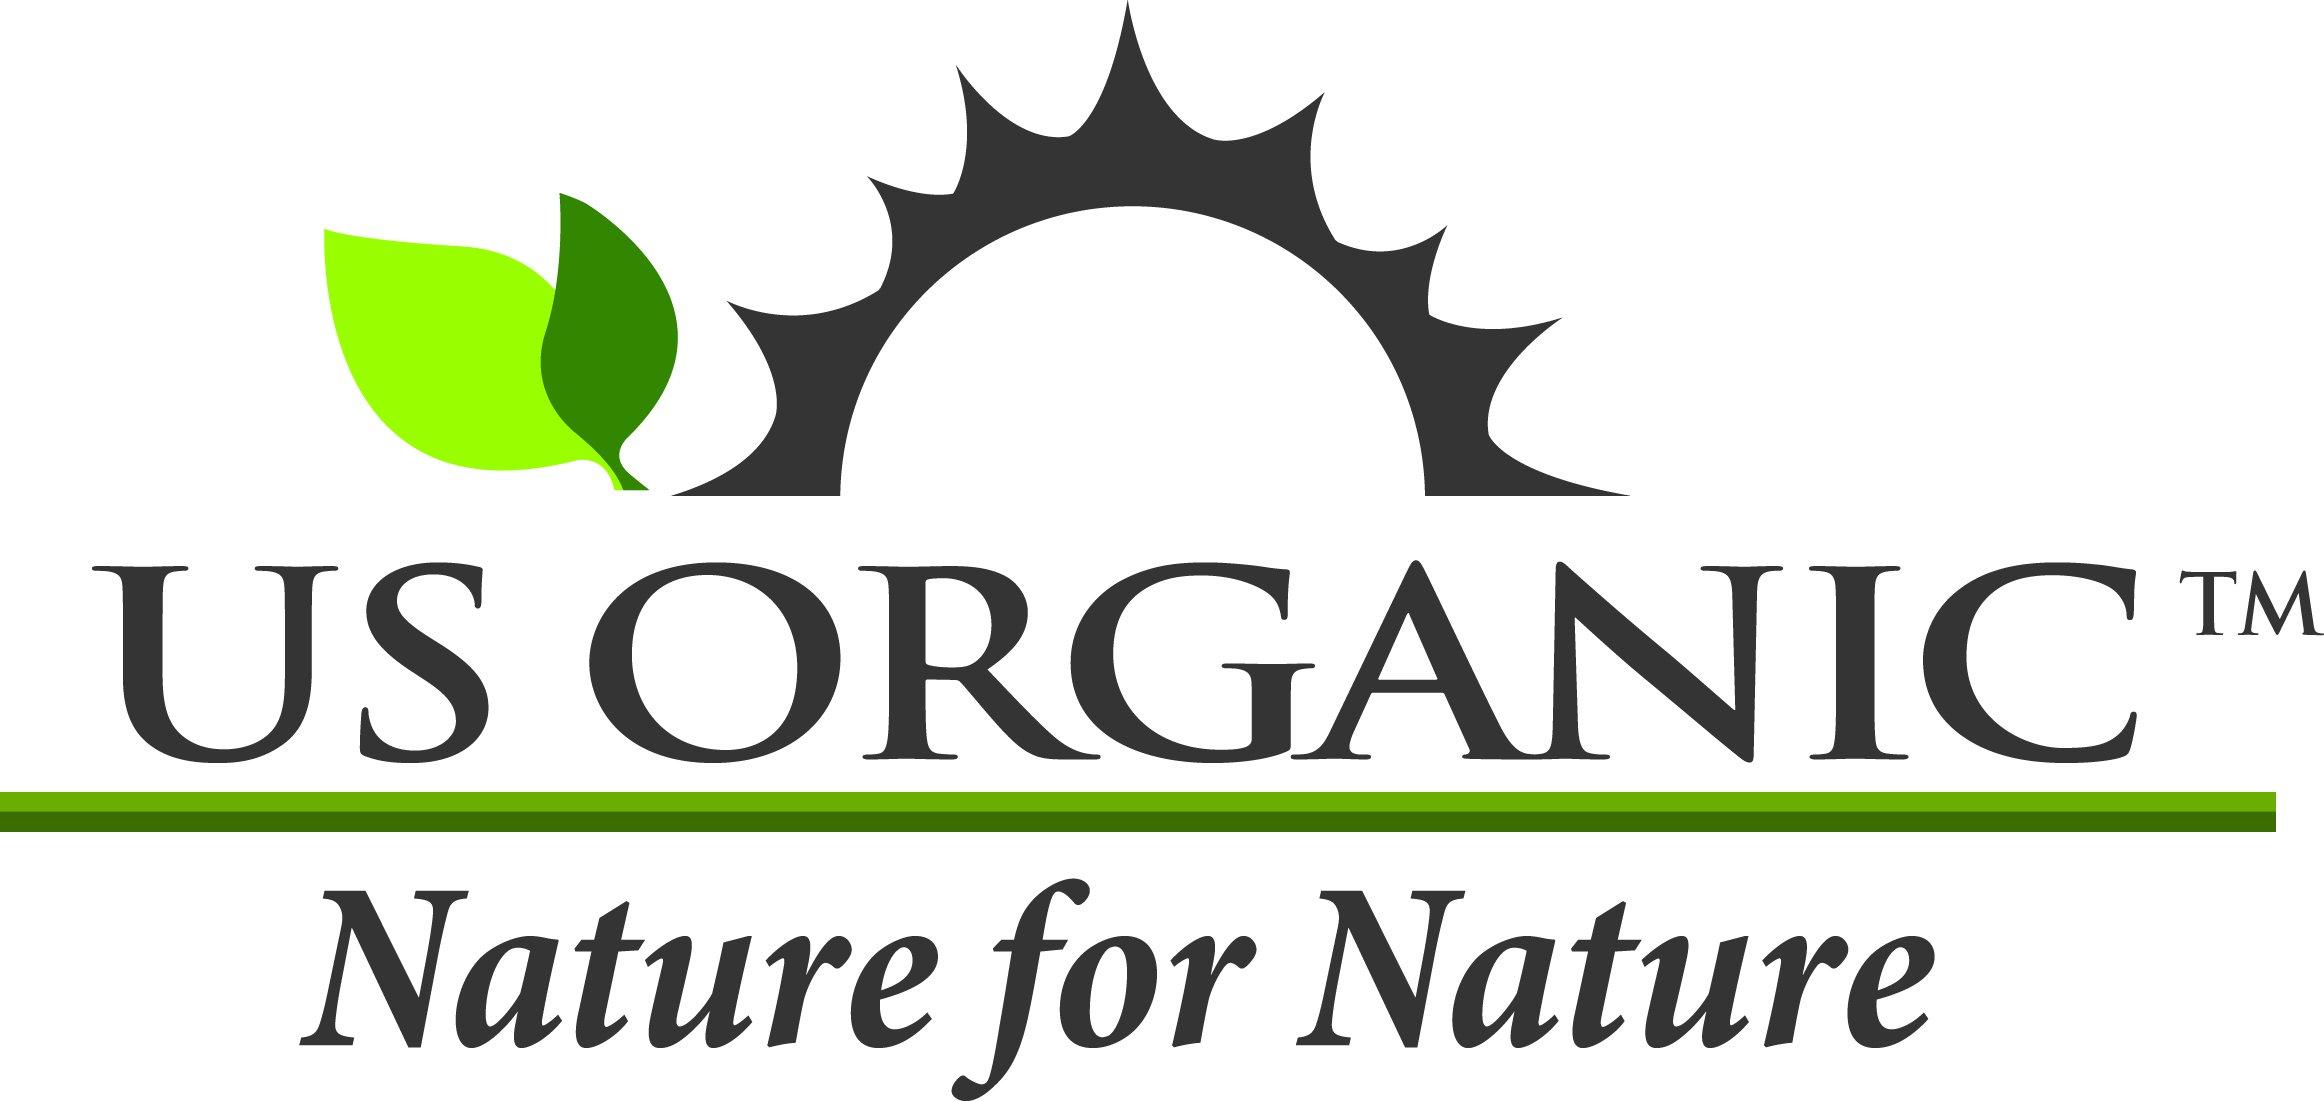 US Organic Moroccan Argan Oil, USDA Certified Organic,100% Pure & Natural, Cold Pressed Virgin, Unrefined, Origin_Morocco (1 Gallon (128 oz)) by US Organic (Image #5)